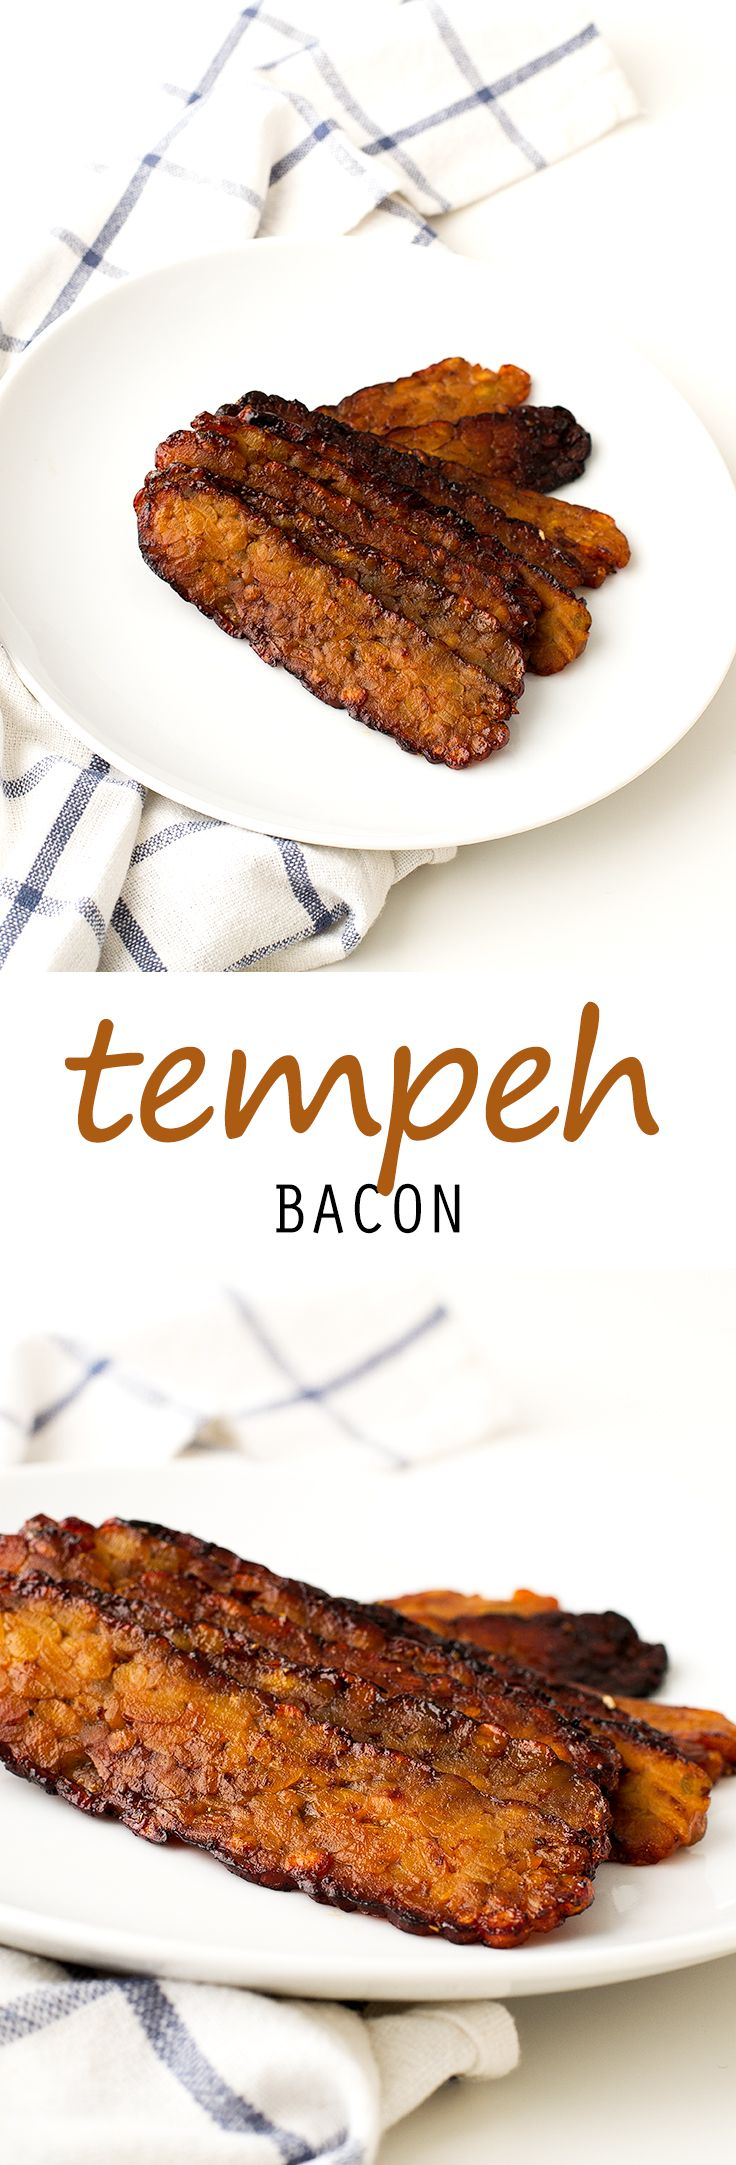 Tempeh Bacon #vegan #glutenfree